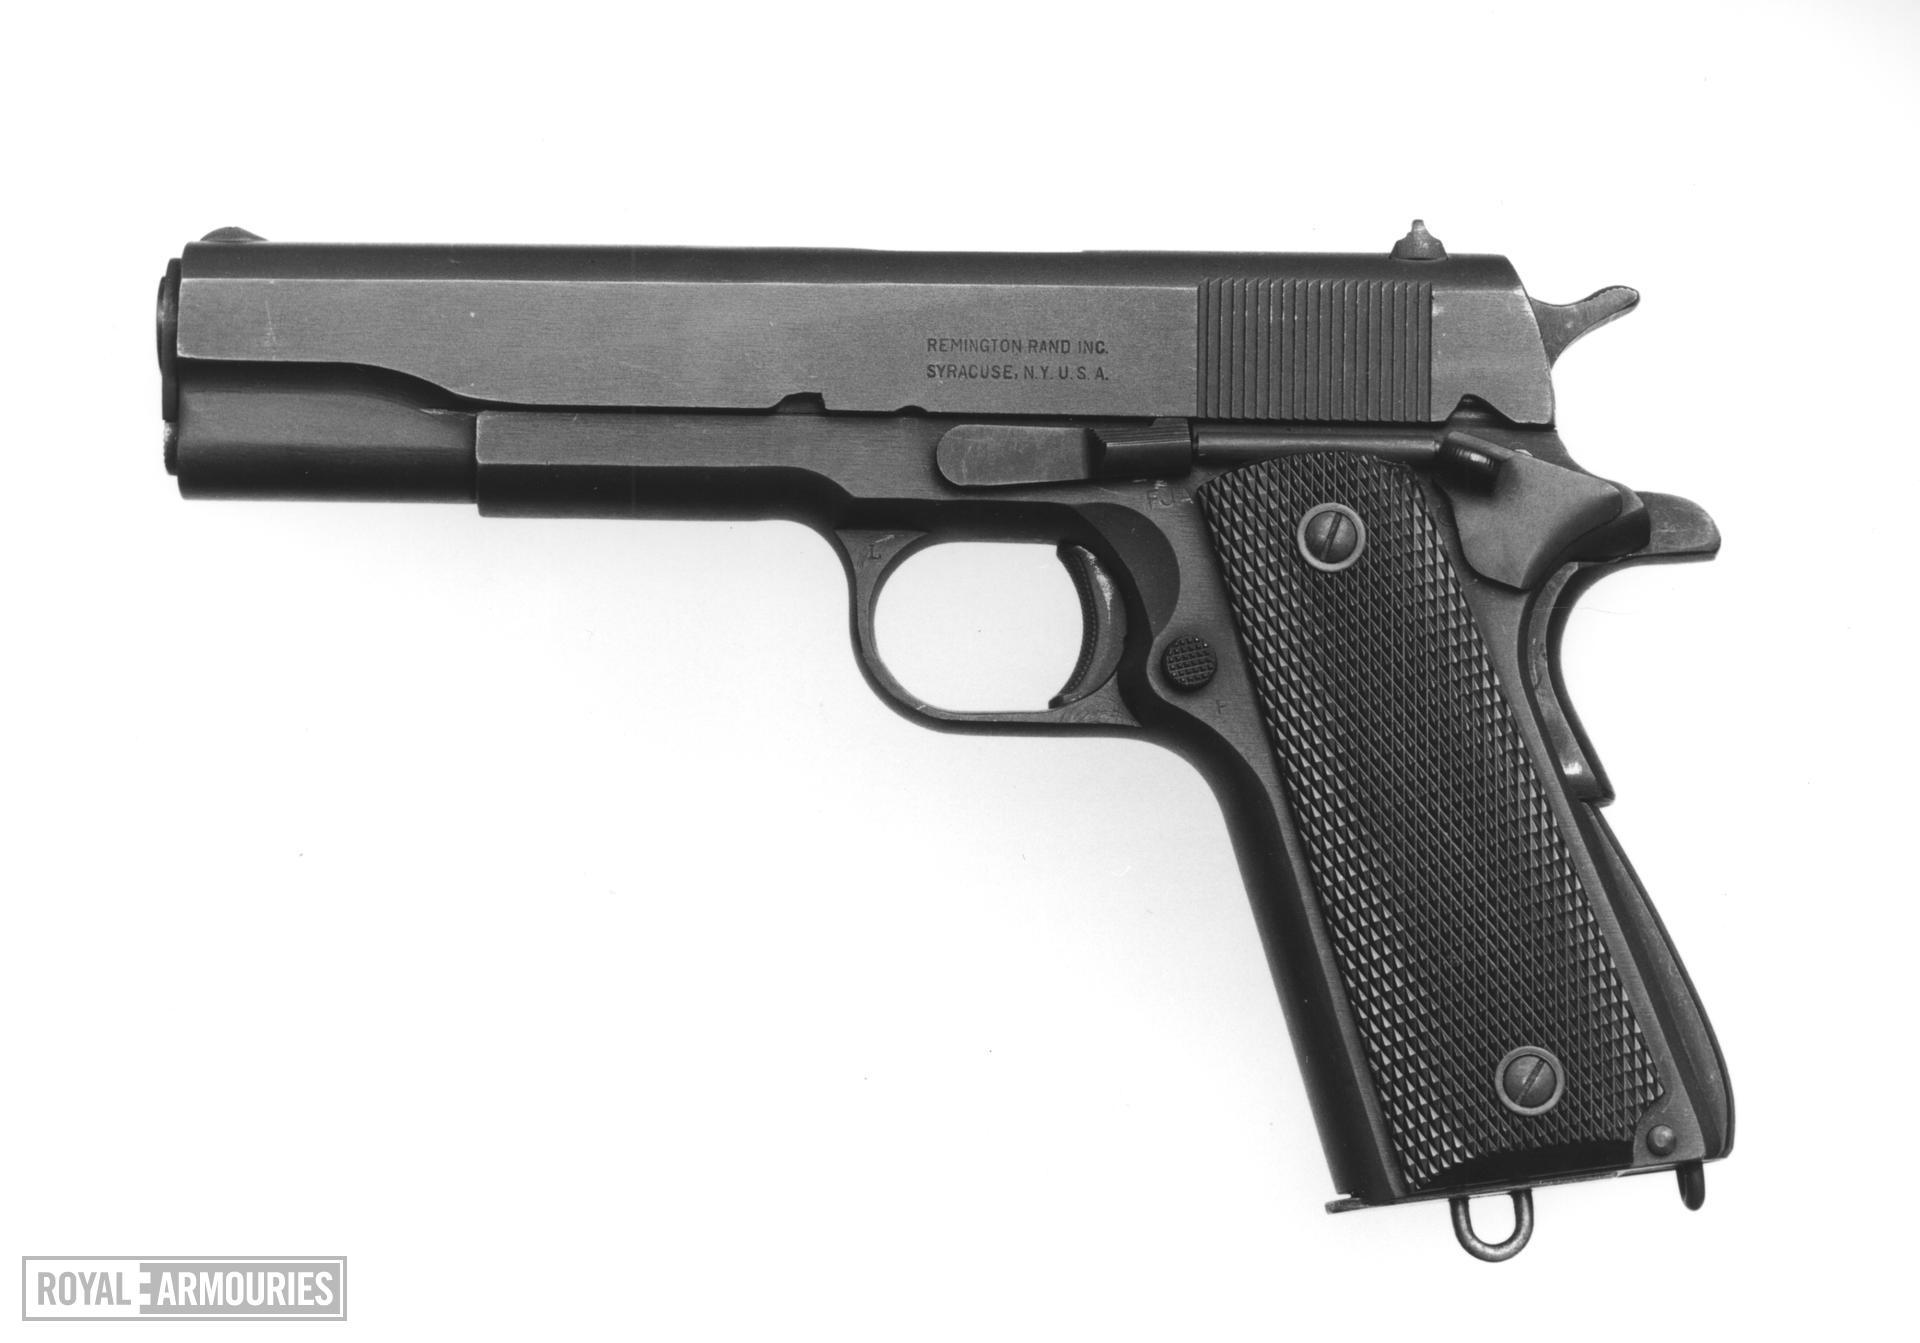 Centrefire self-loading military pistol - Colt 1911 A1